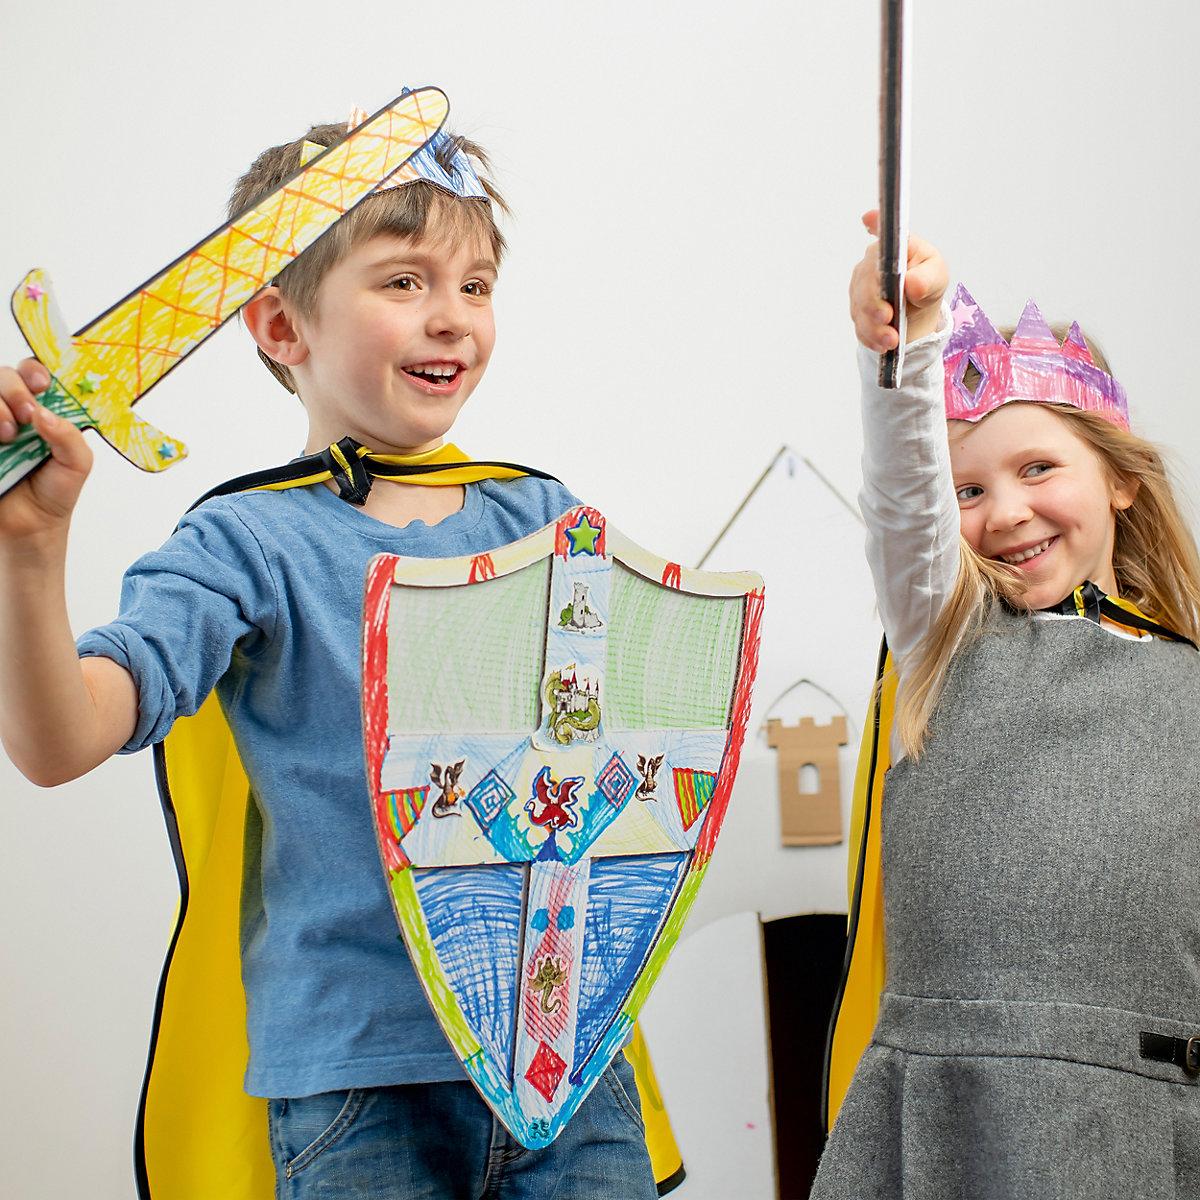 ritter box für 7 kinder mydinobox  mytoys